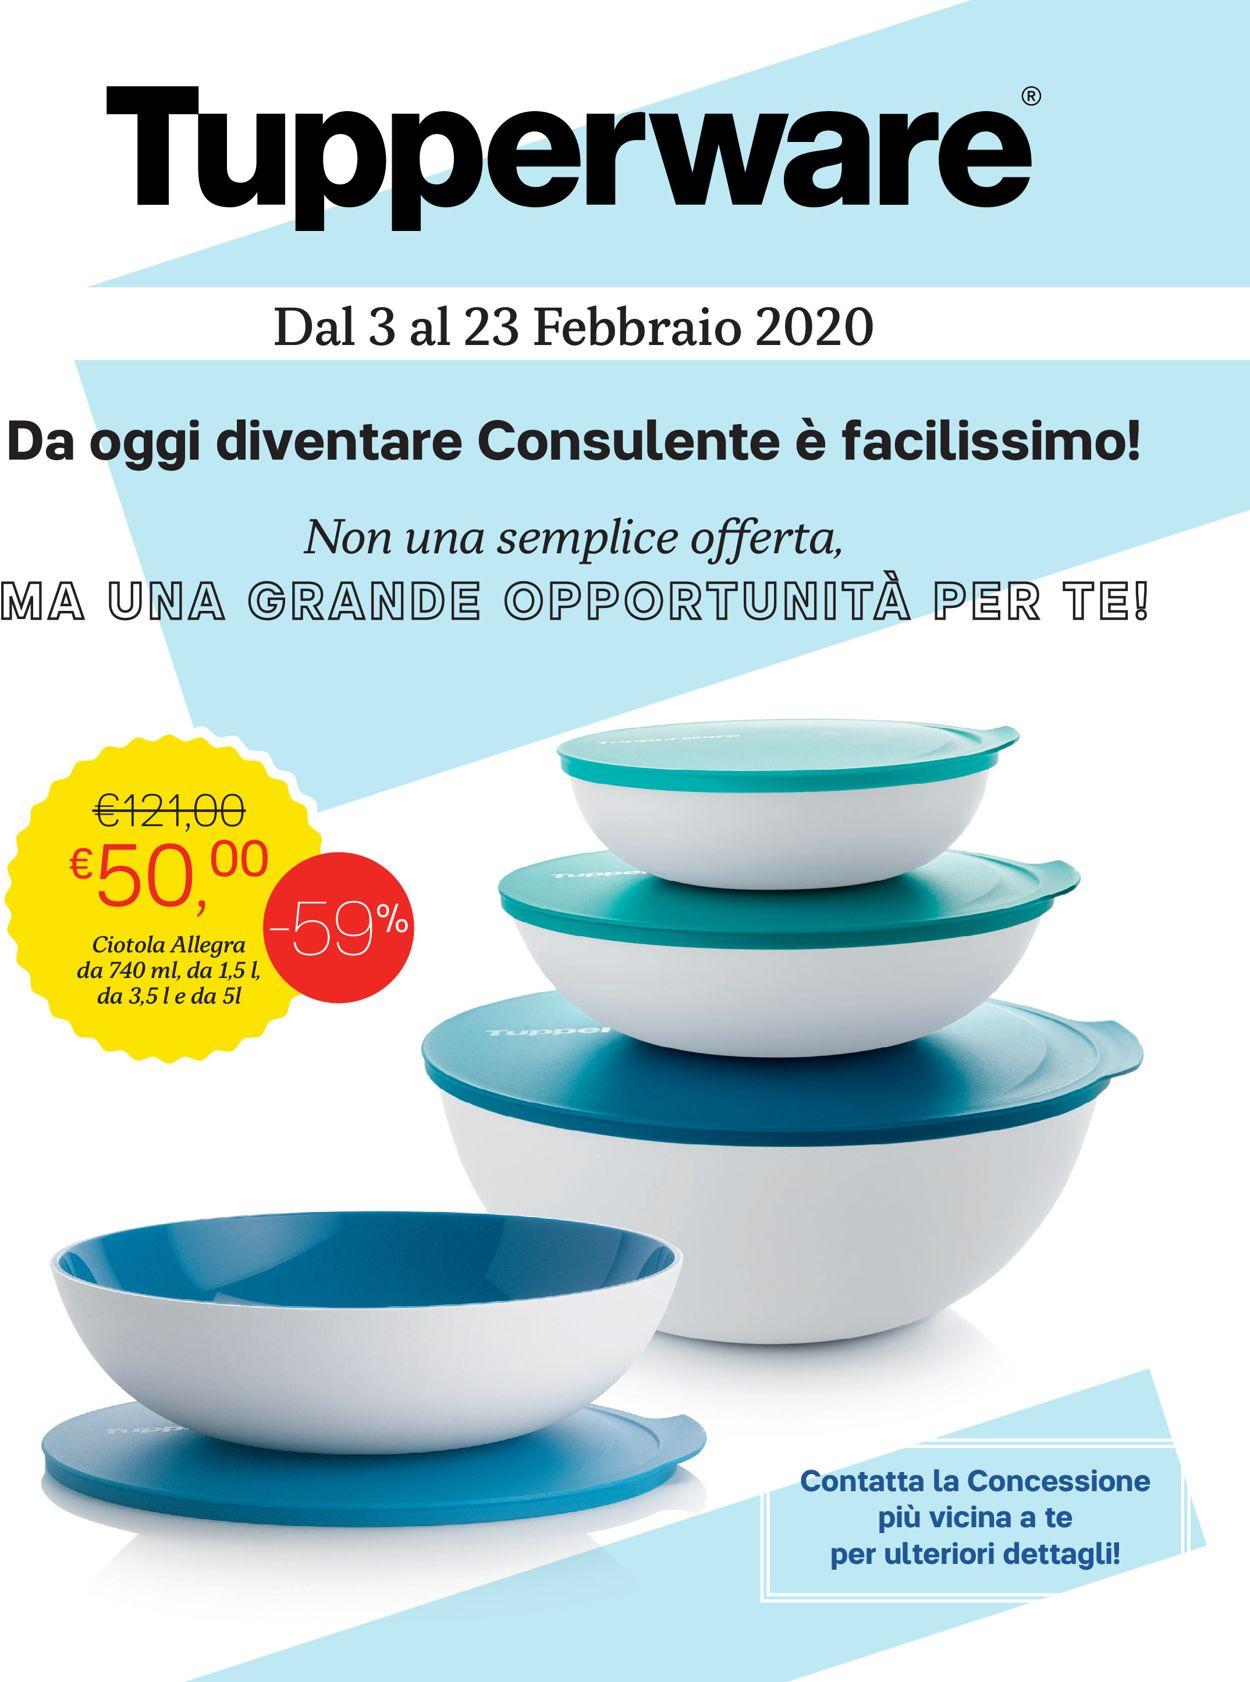 Volantino Tupperware - Offerte 03/02-23/02/2020